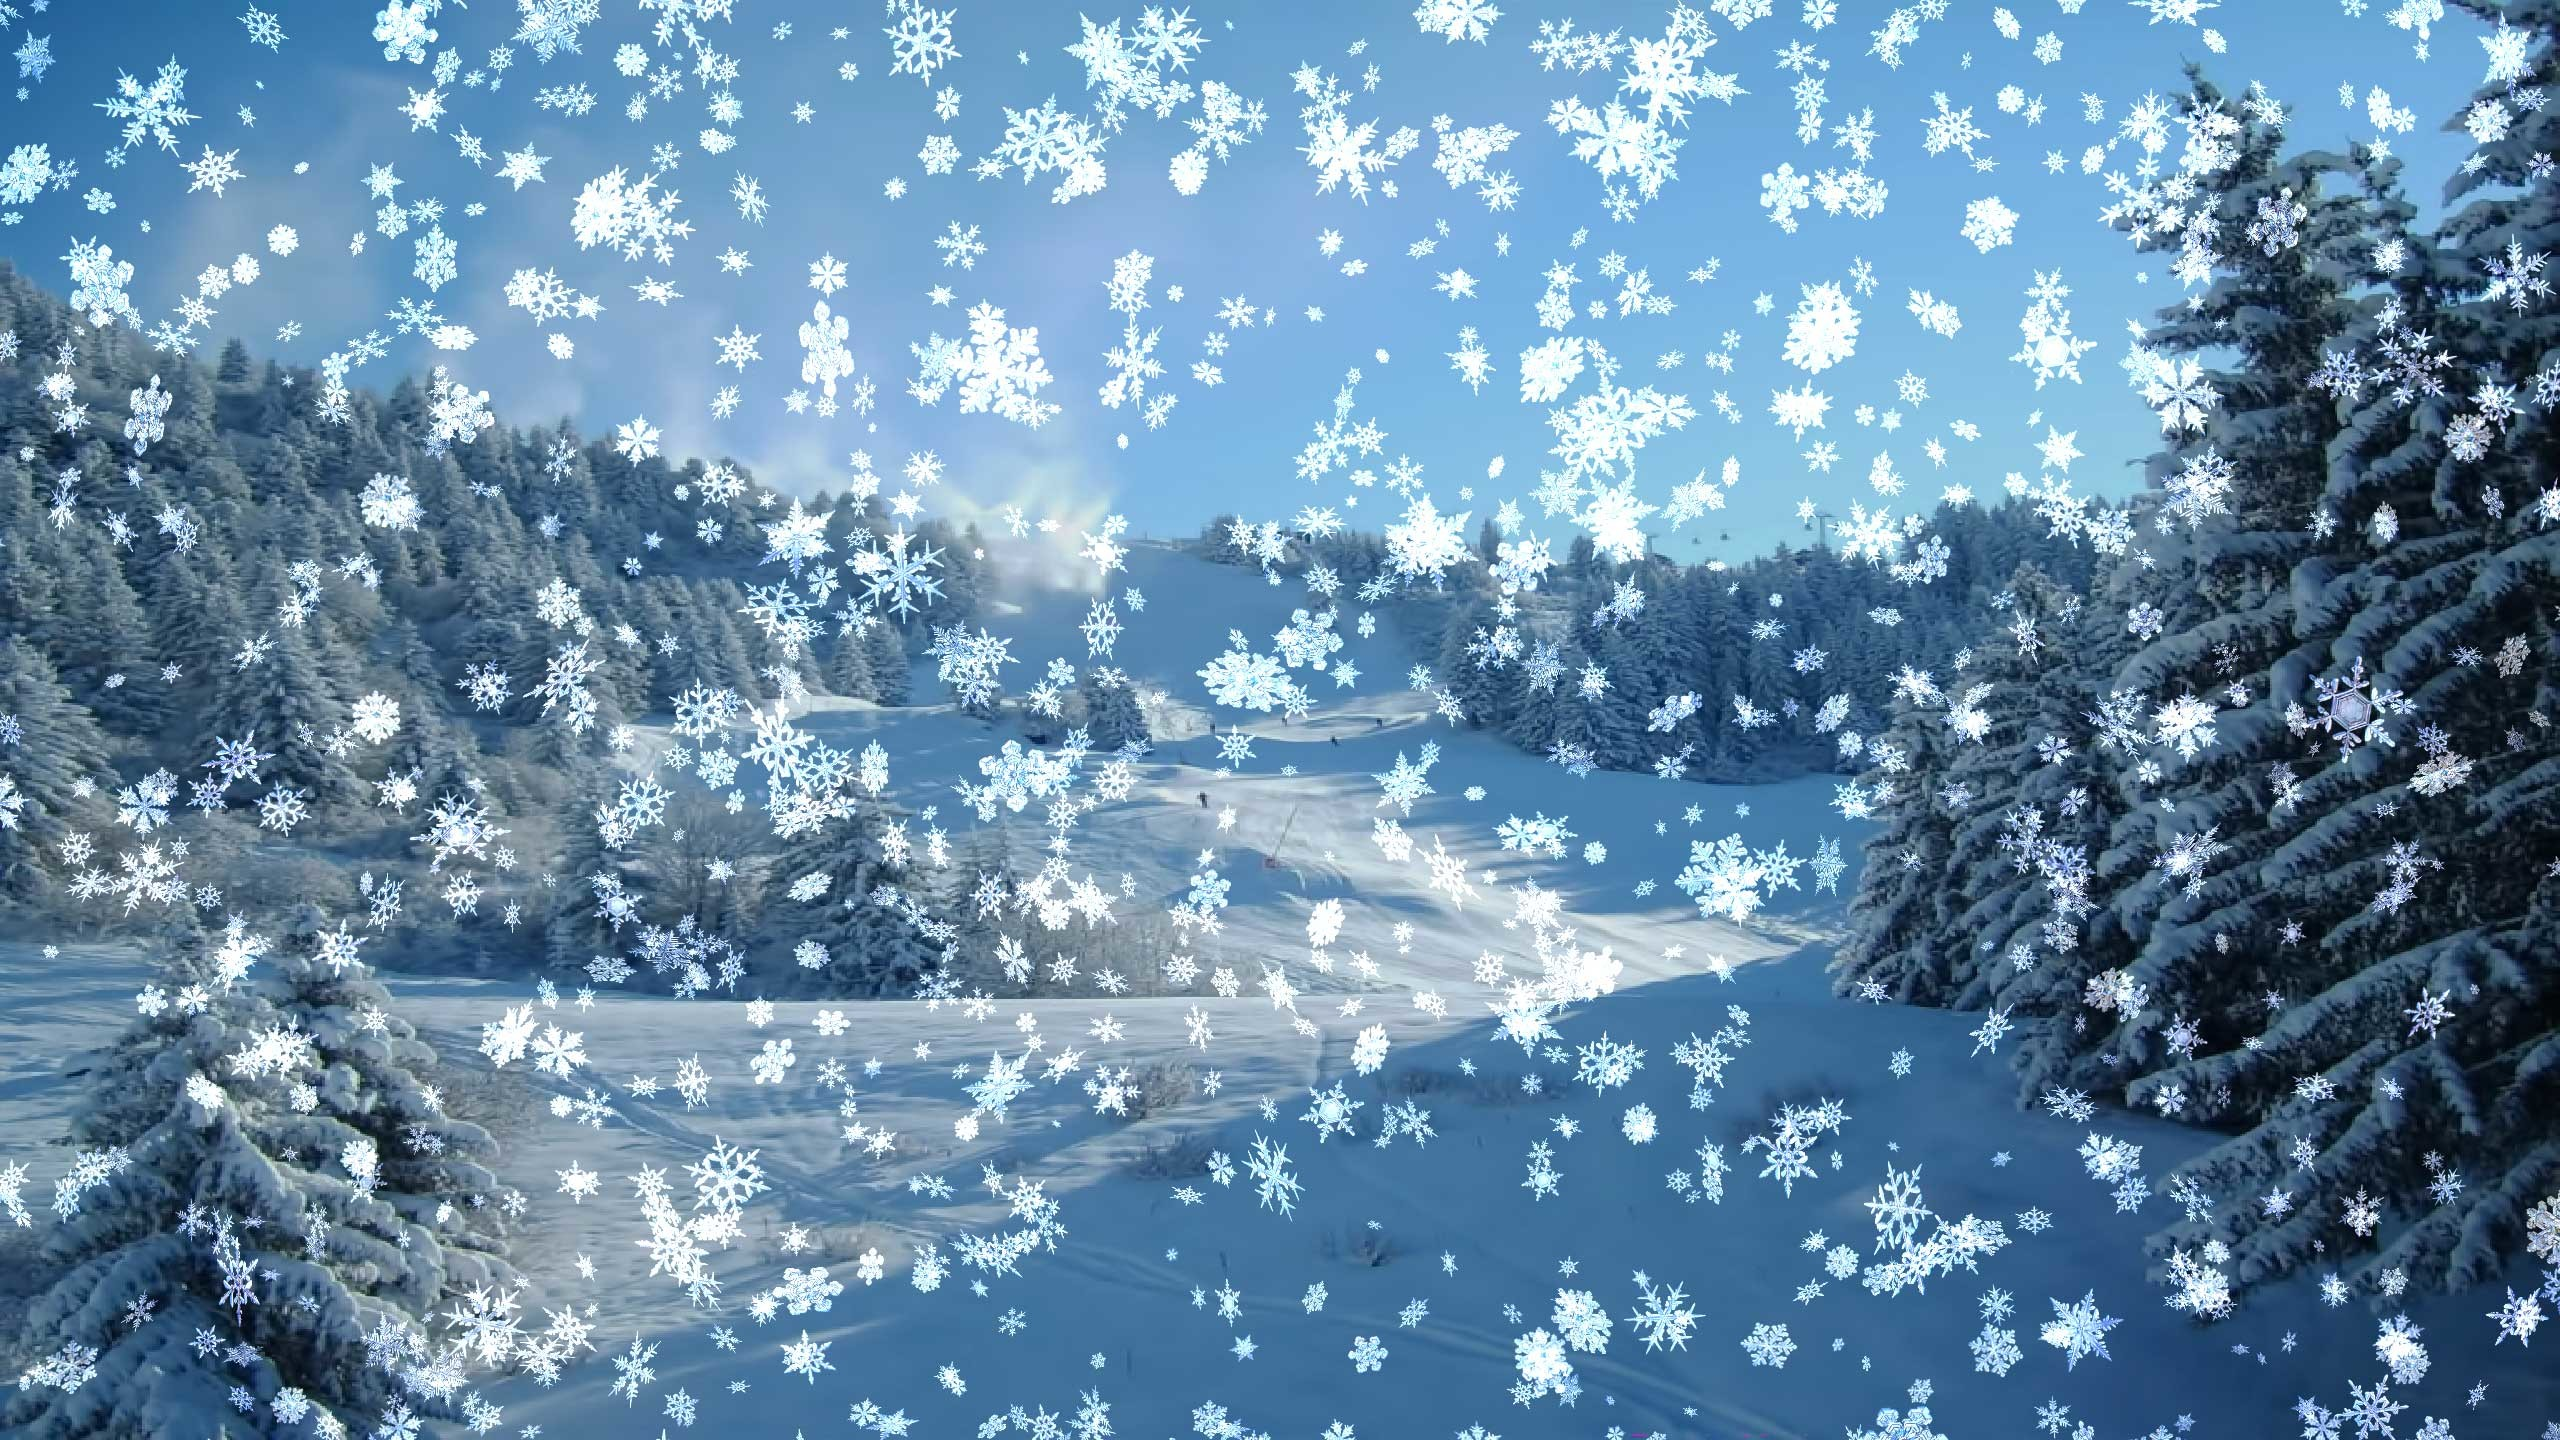 Snow Scenes Wallpaper 56 Images